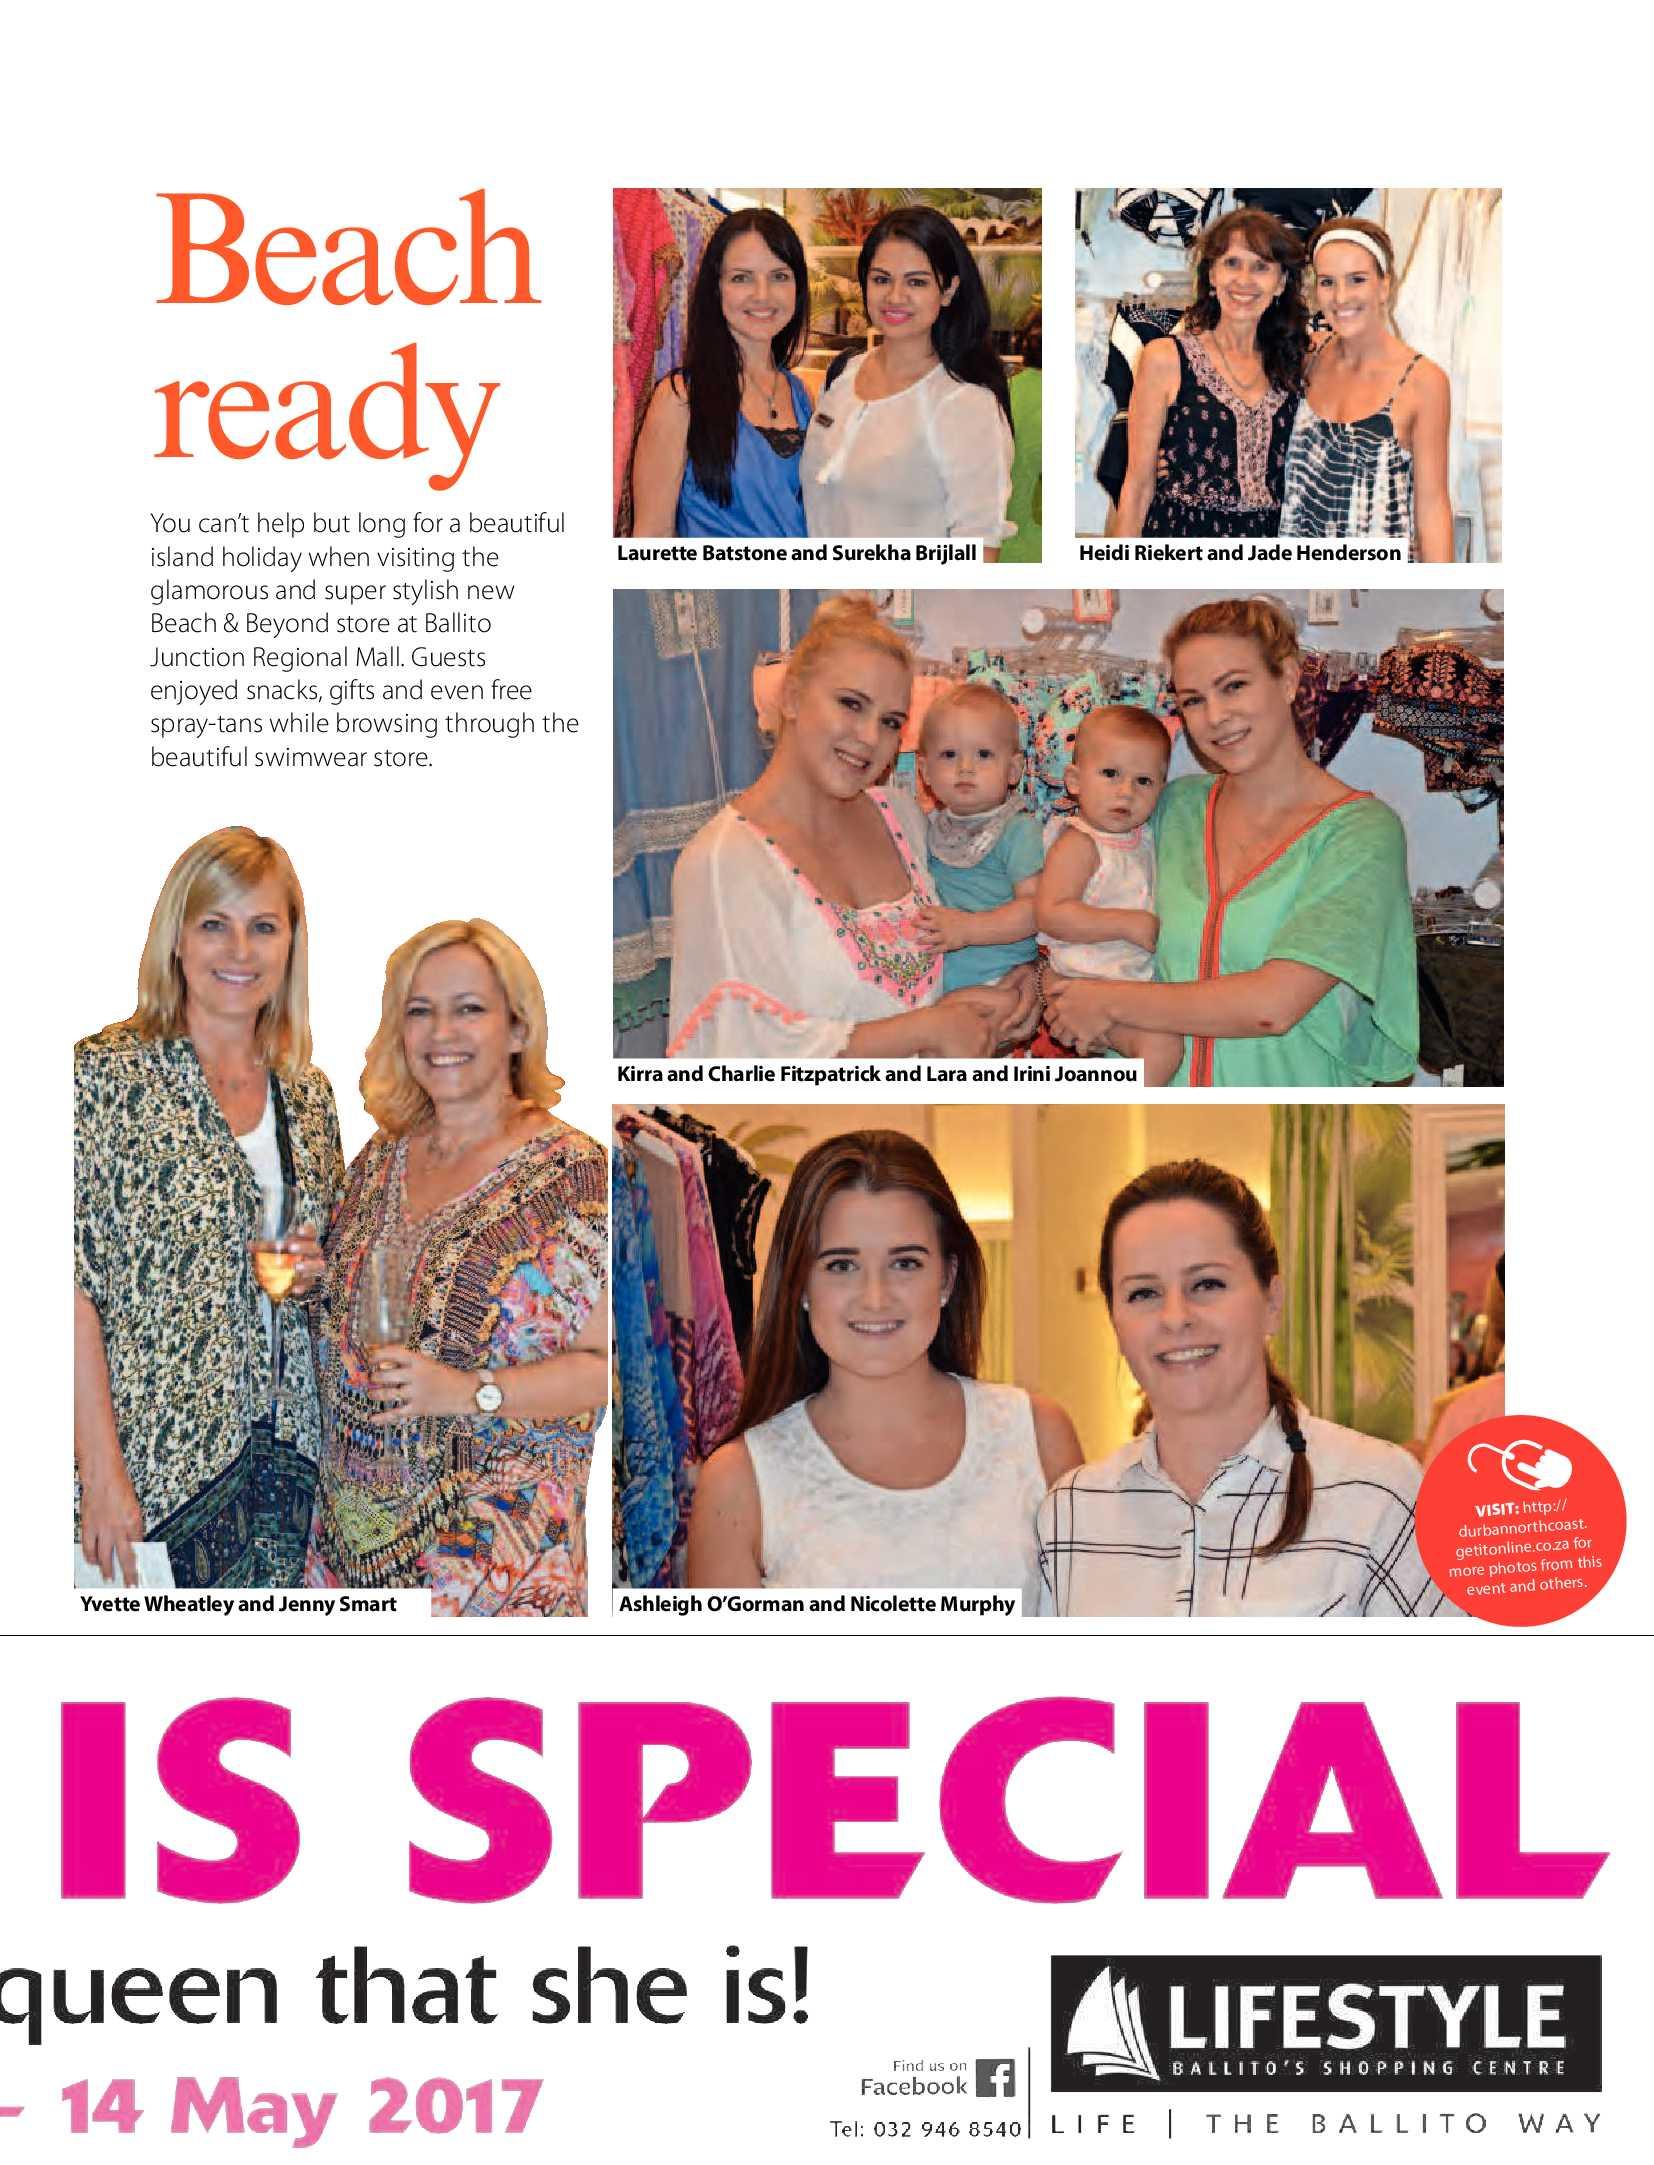 get-magazine-ballitoumhlanga-may-2017-epapers-page-11